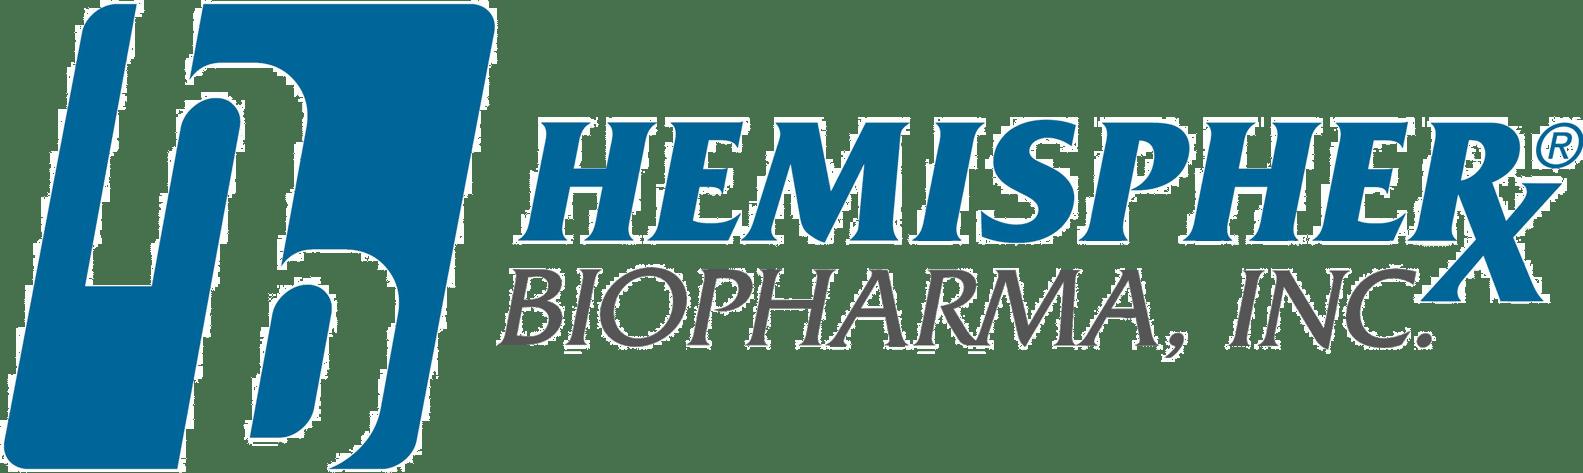 Case Study | Improving Titer - KBI Biopharma